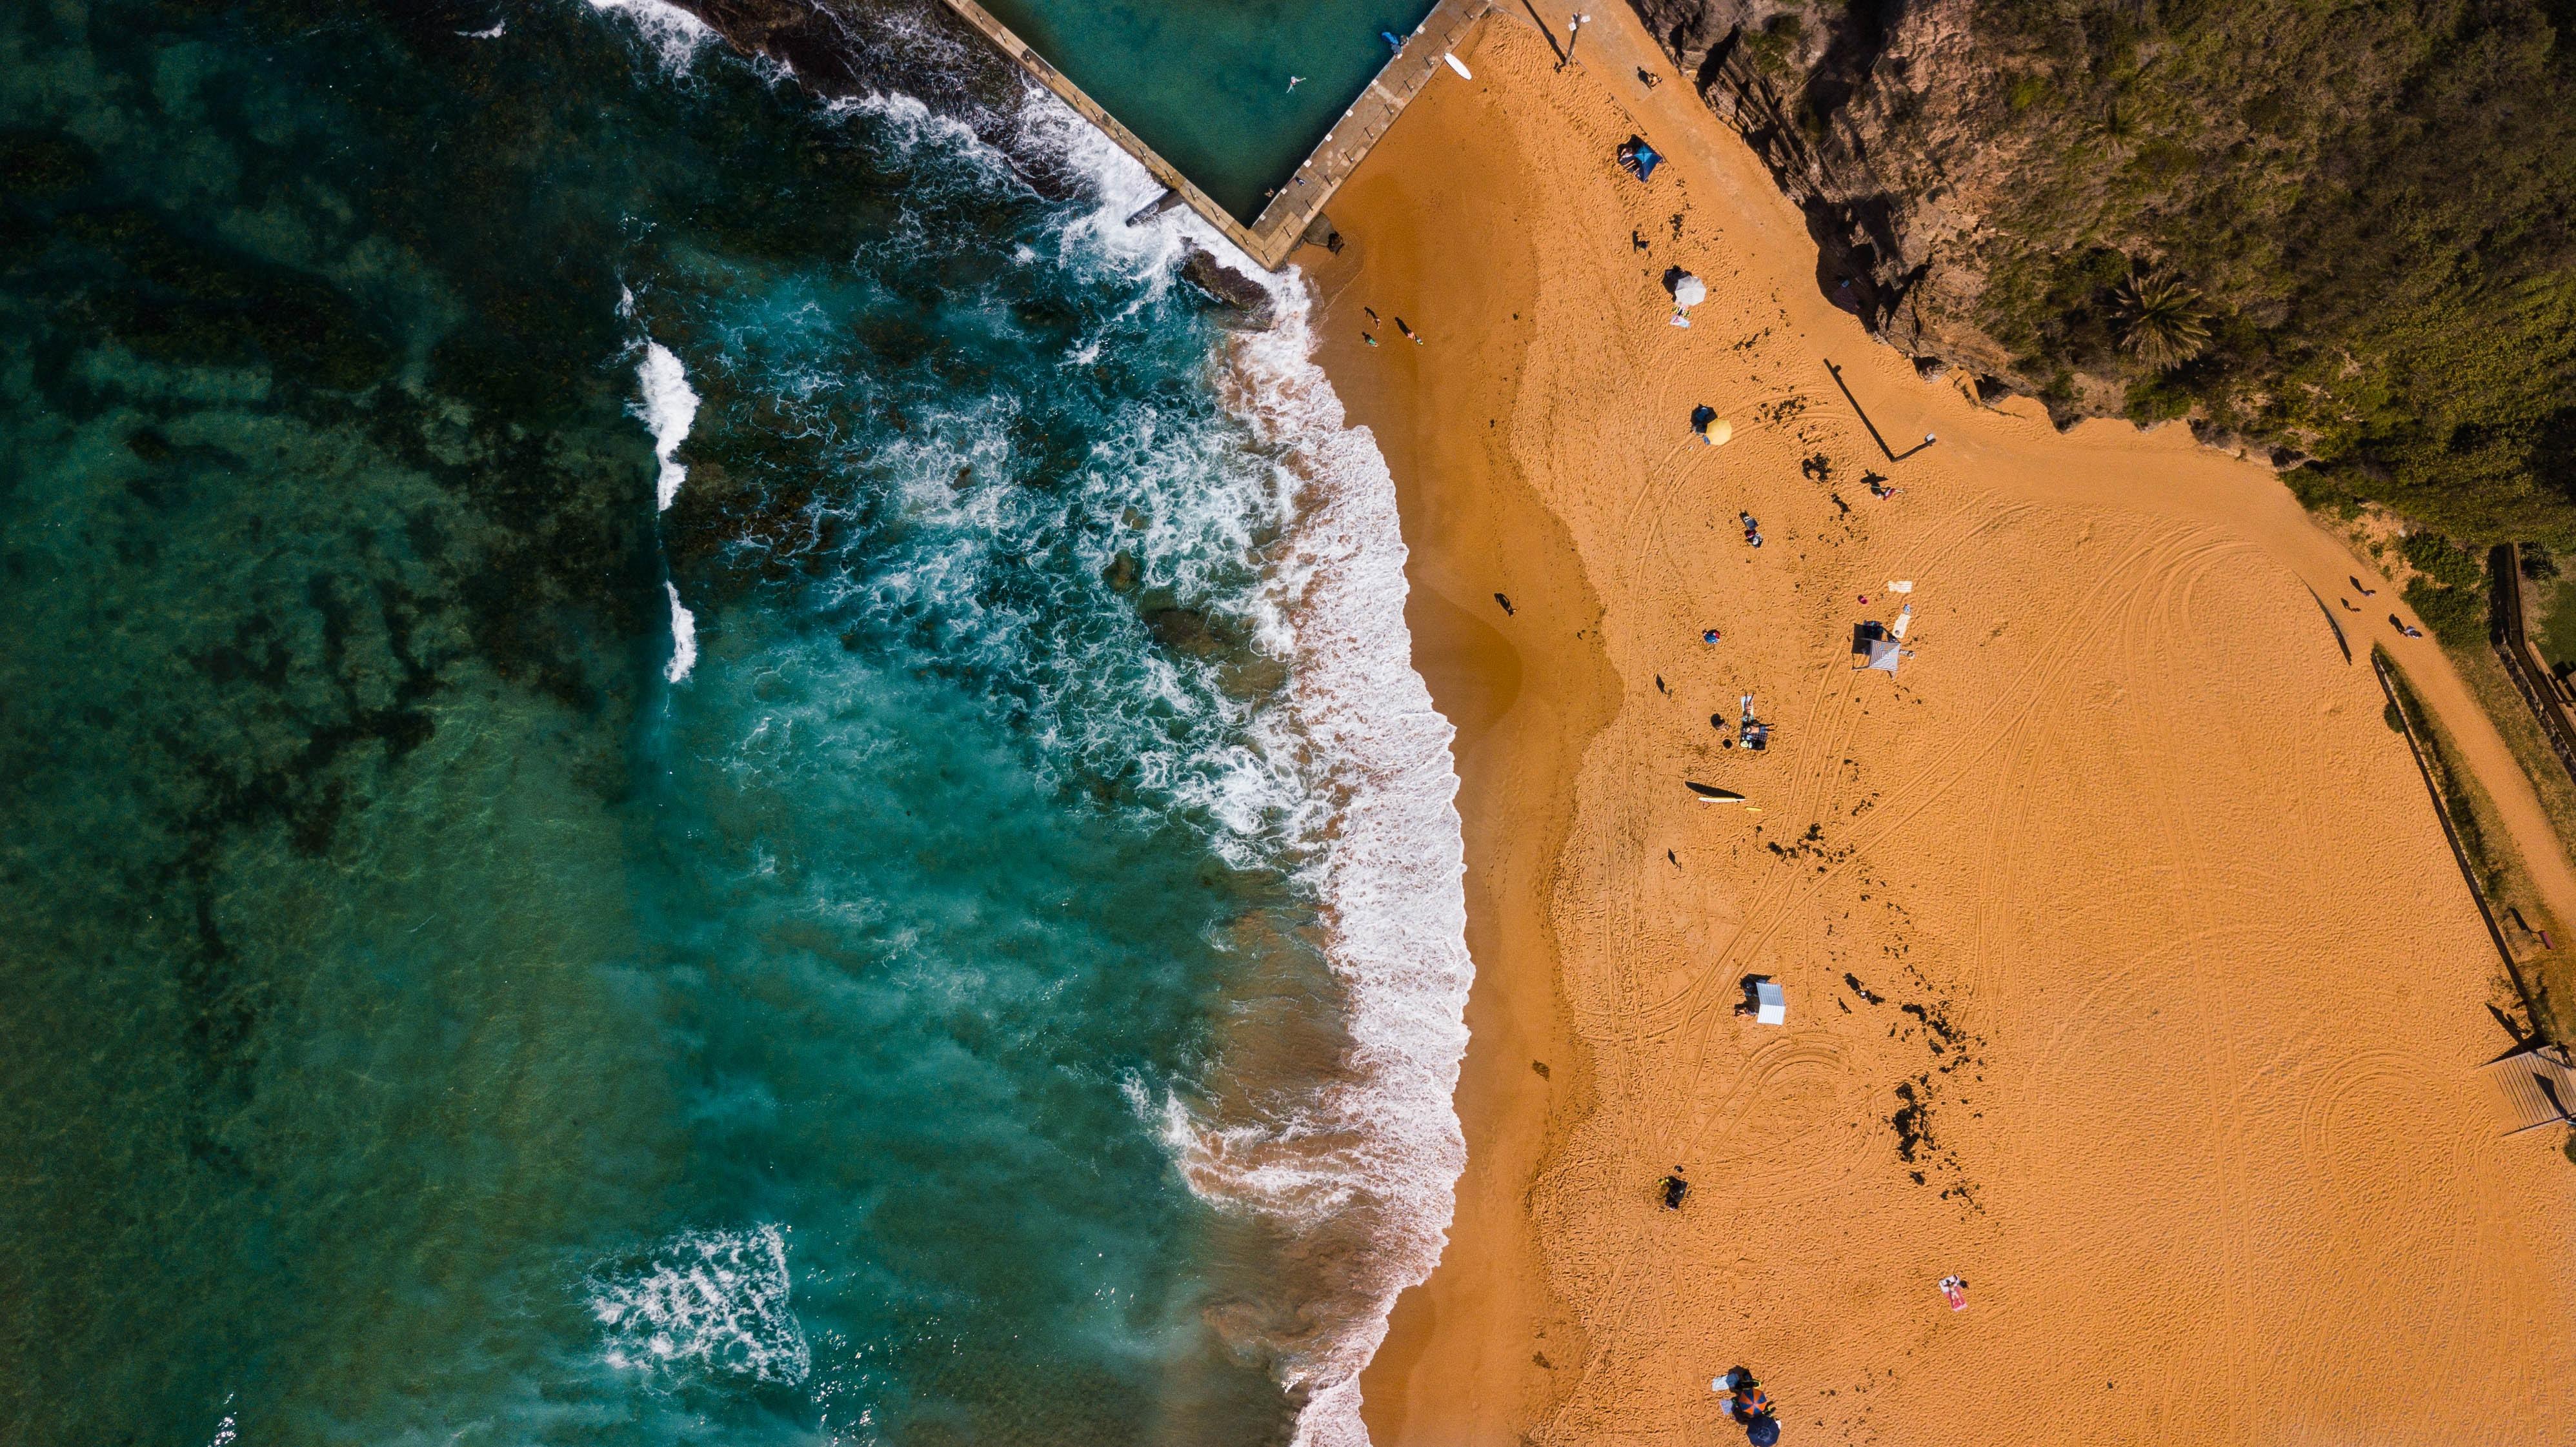 aerial photo of brown sand beach